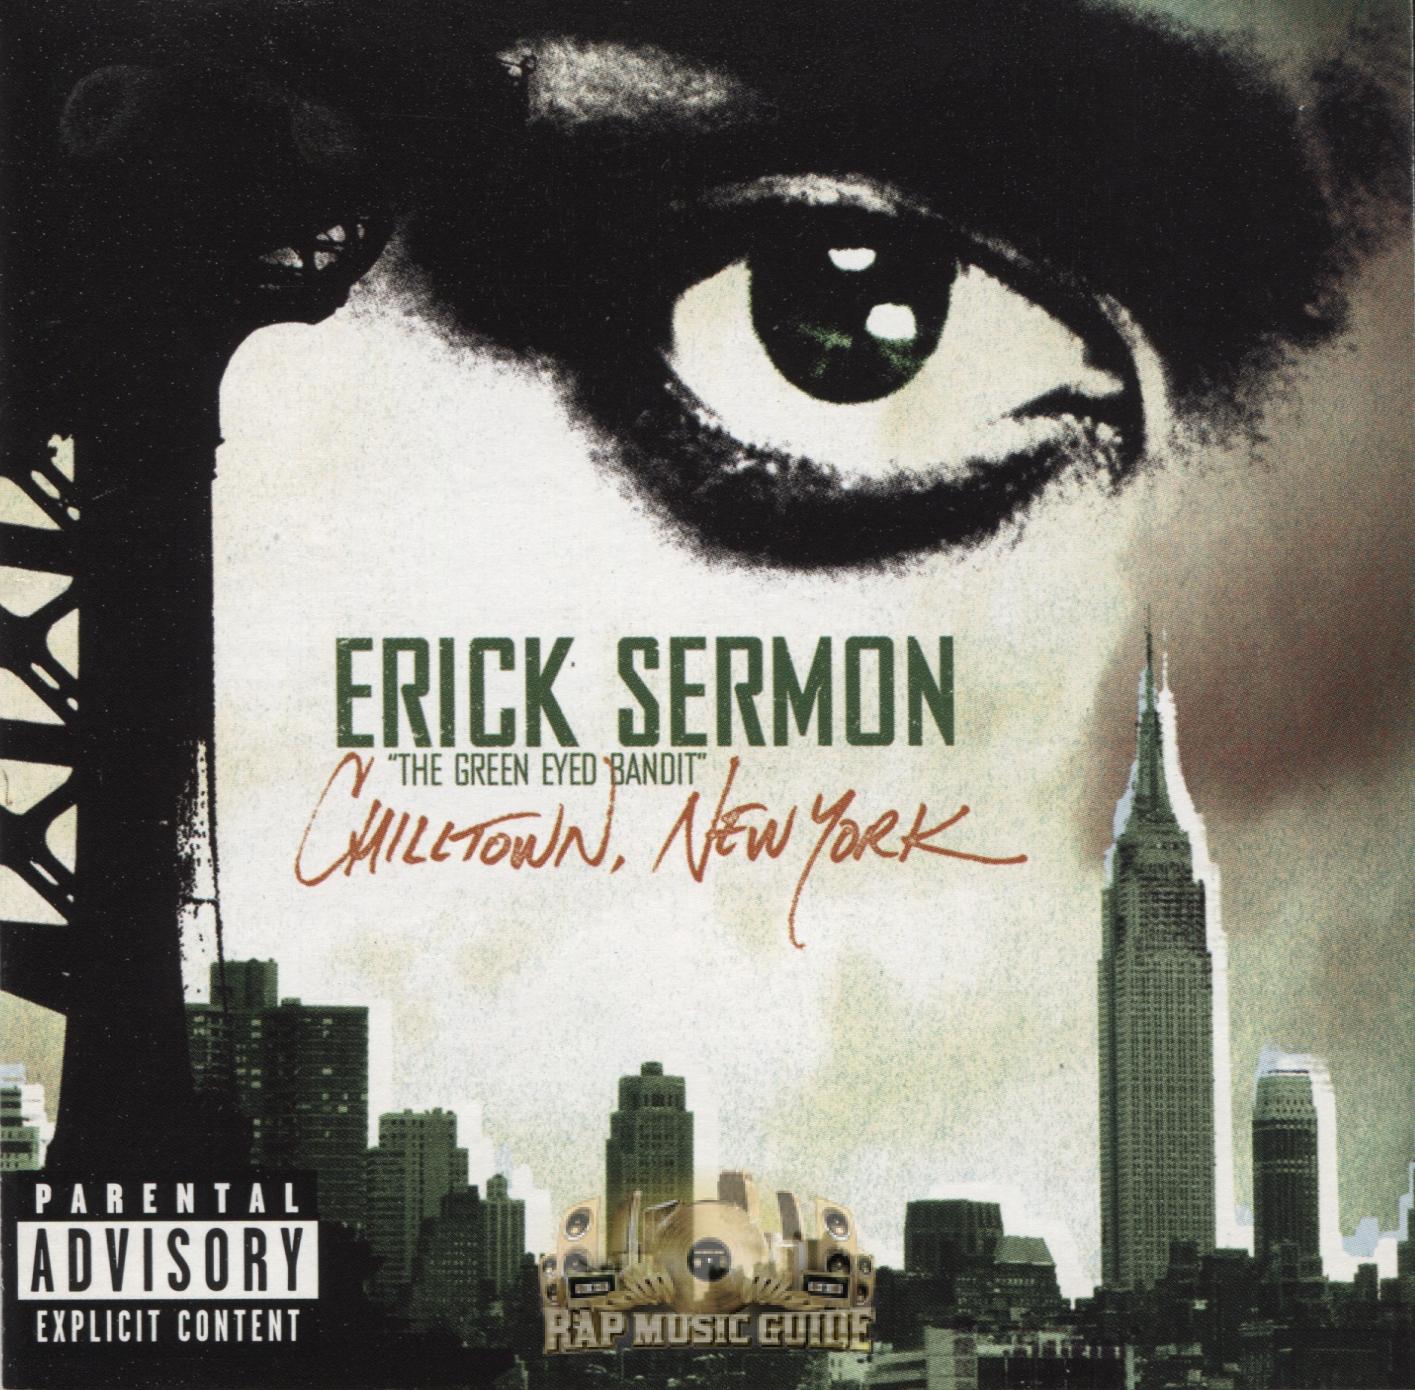 Erick Sermon - Chilltown, New York.jpg